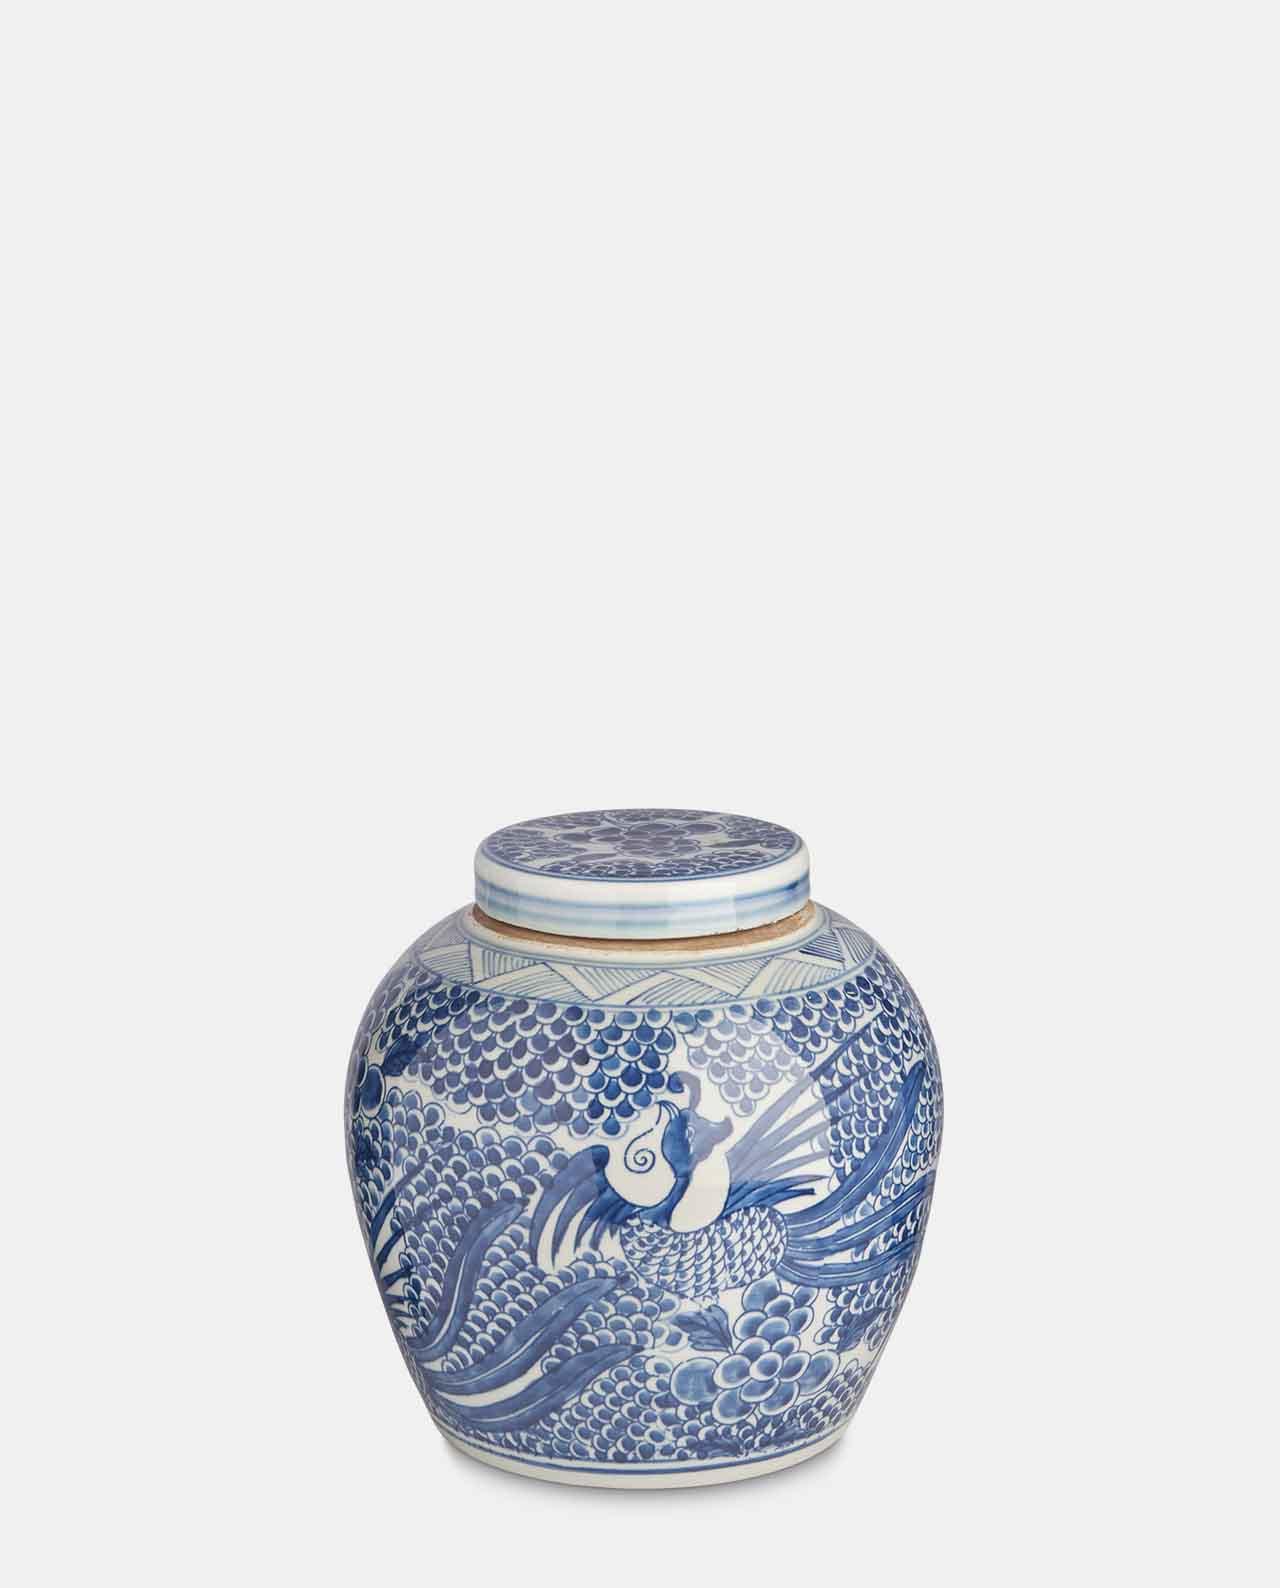 Blue & White Porcelain Jar No 4